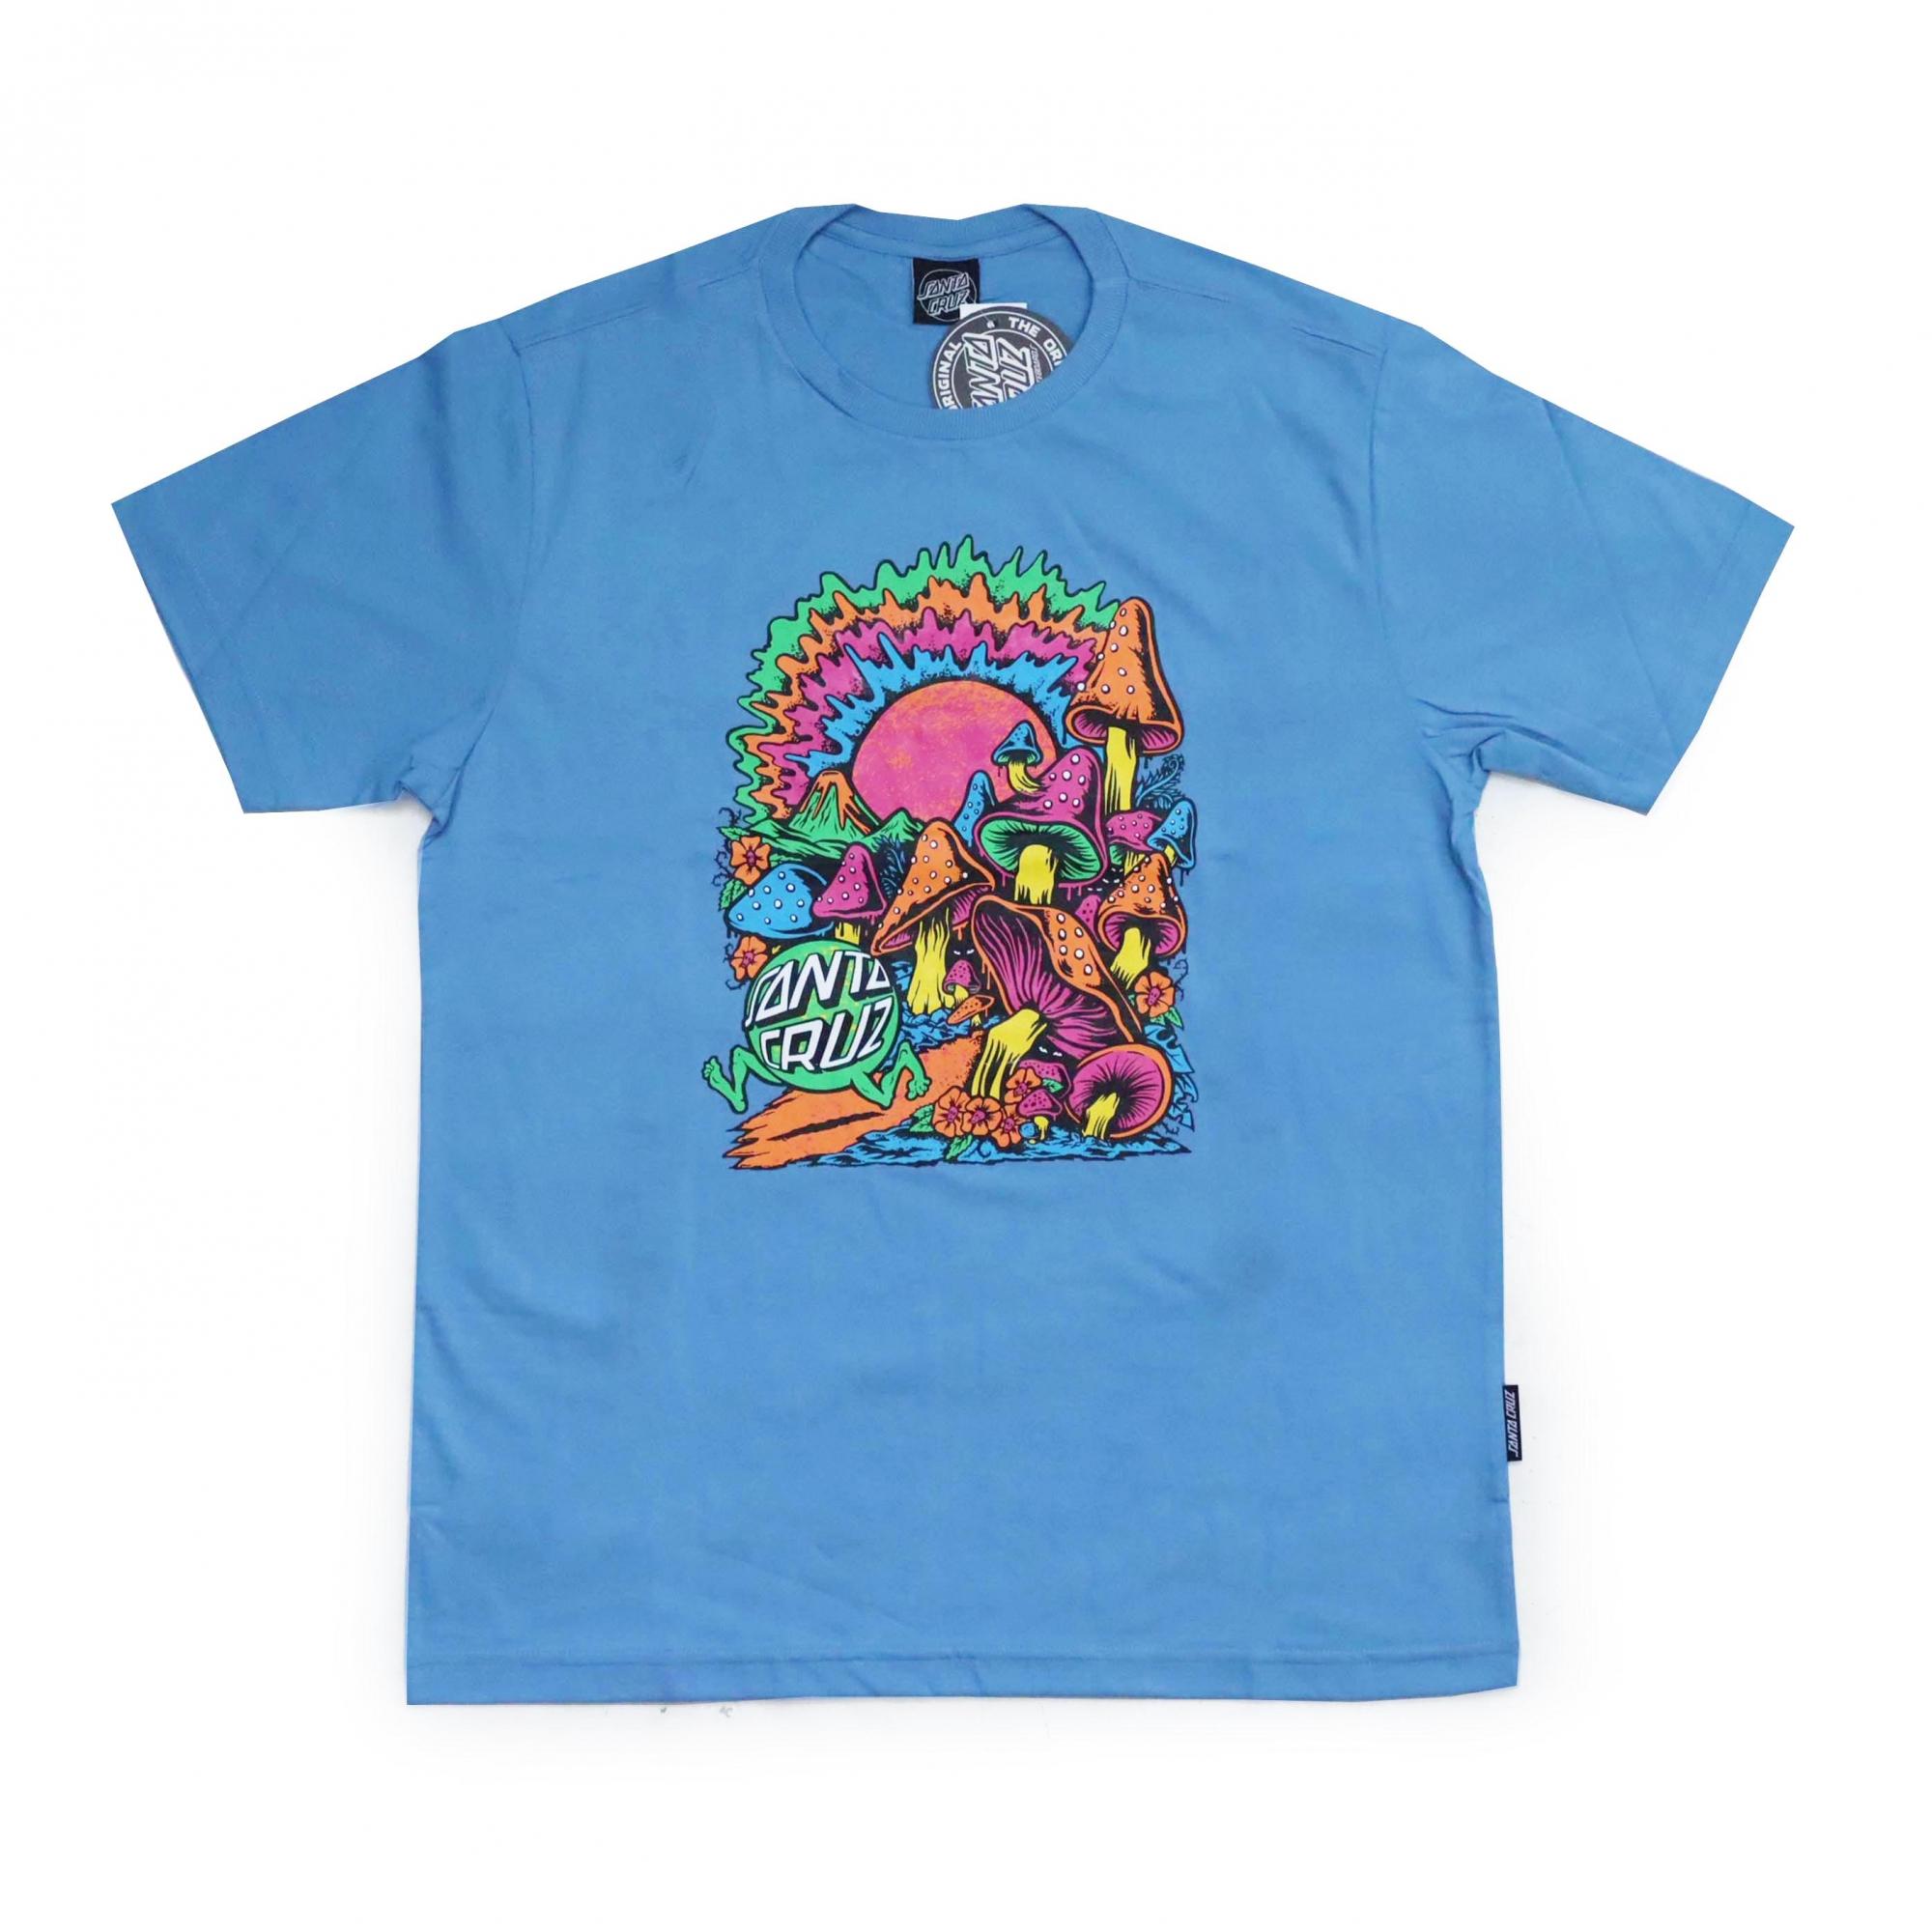 Camiseta Santa Cruz Toxic Wasteland - Azul Claro